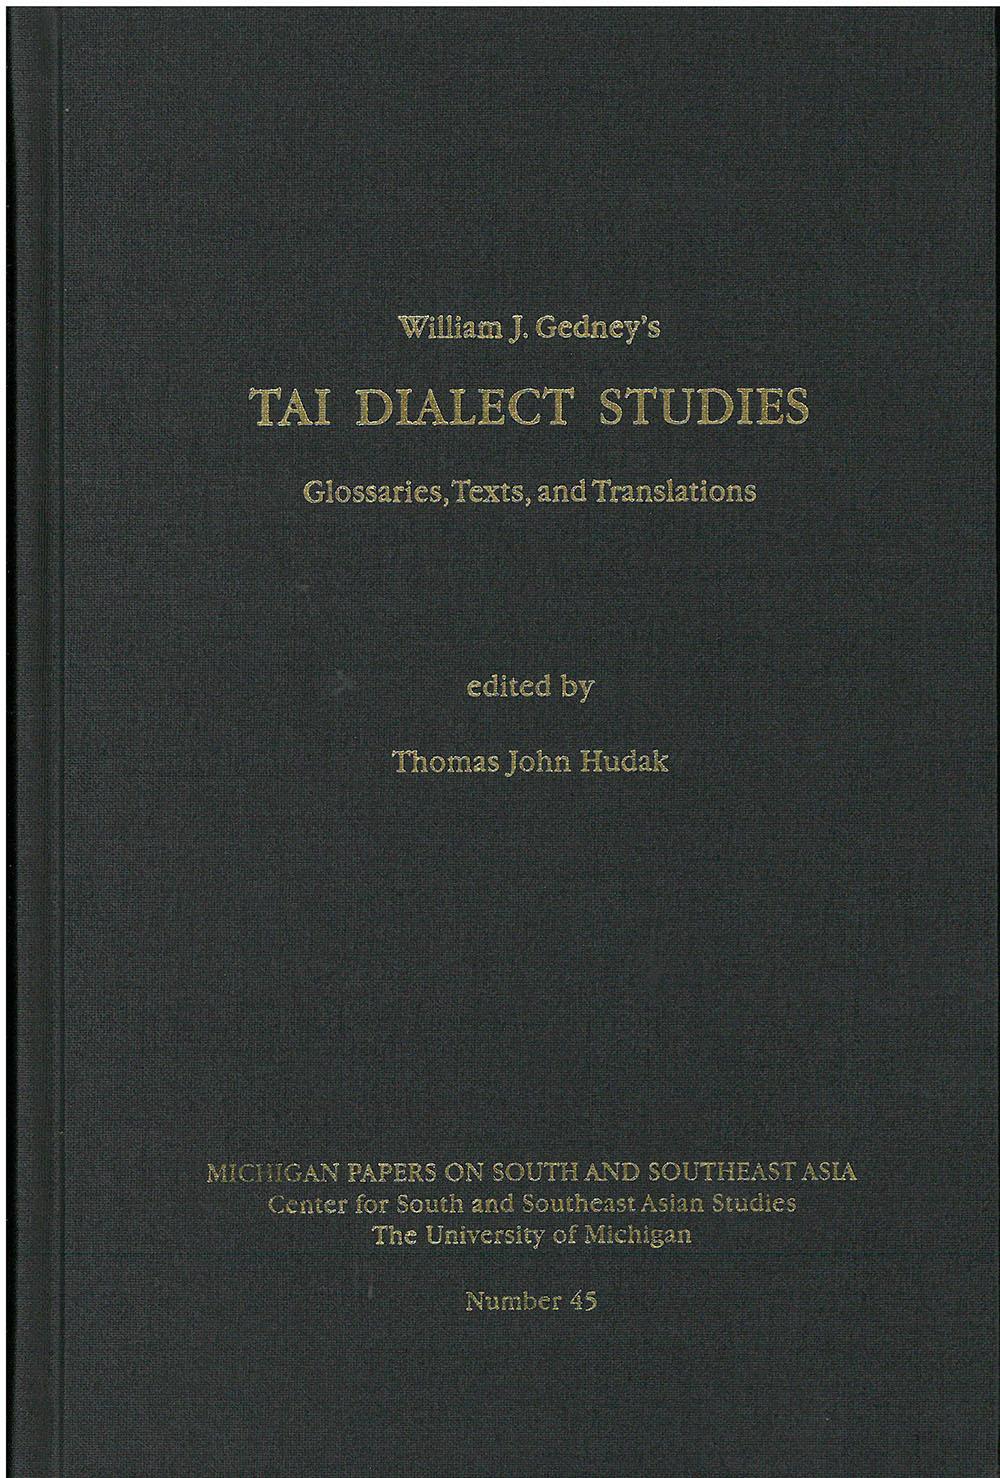 Tai Dialect Studies